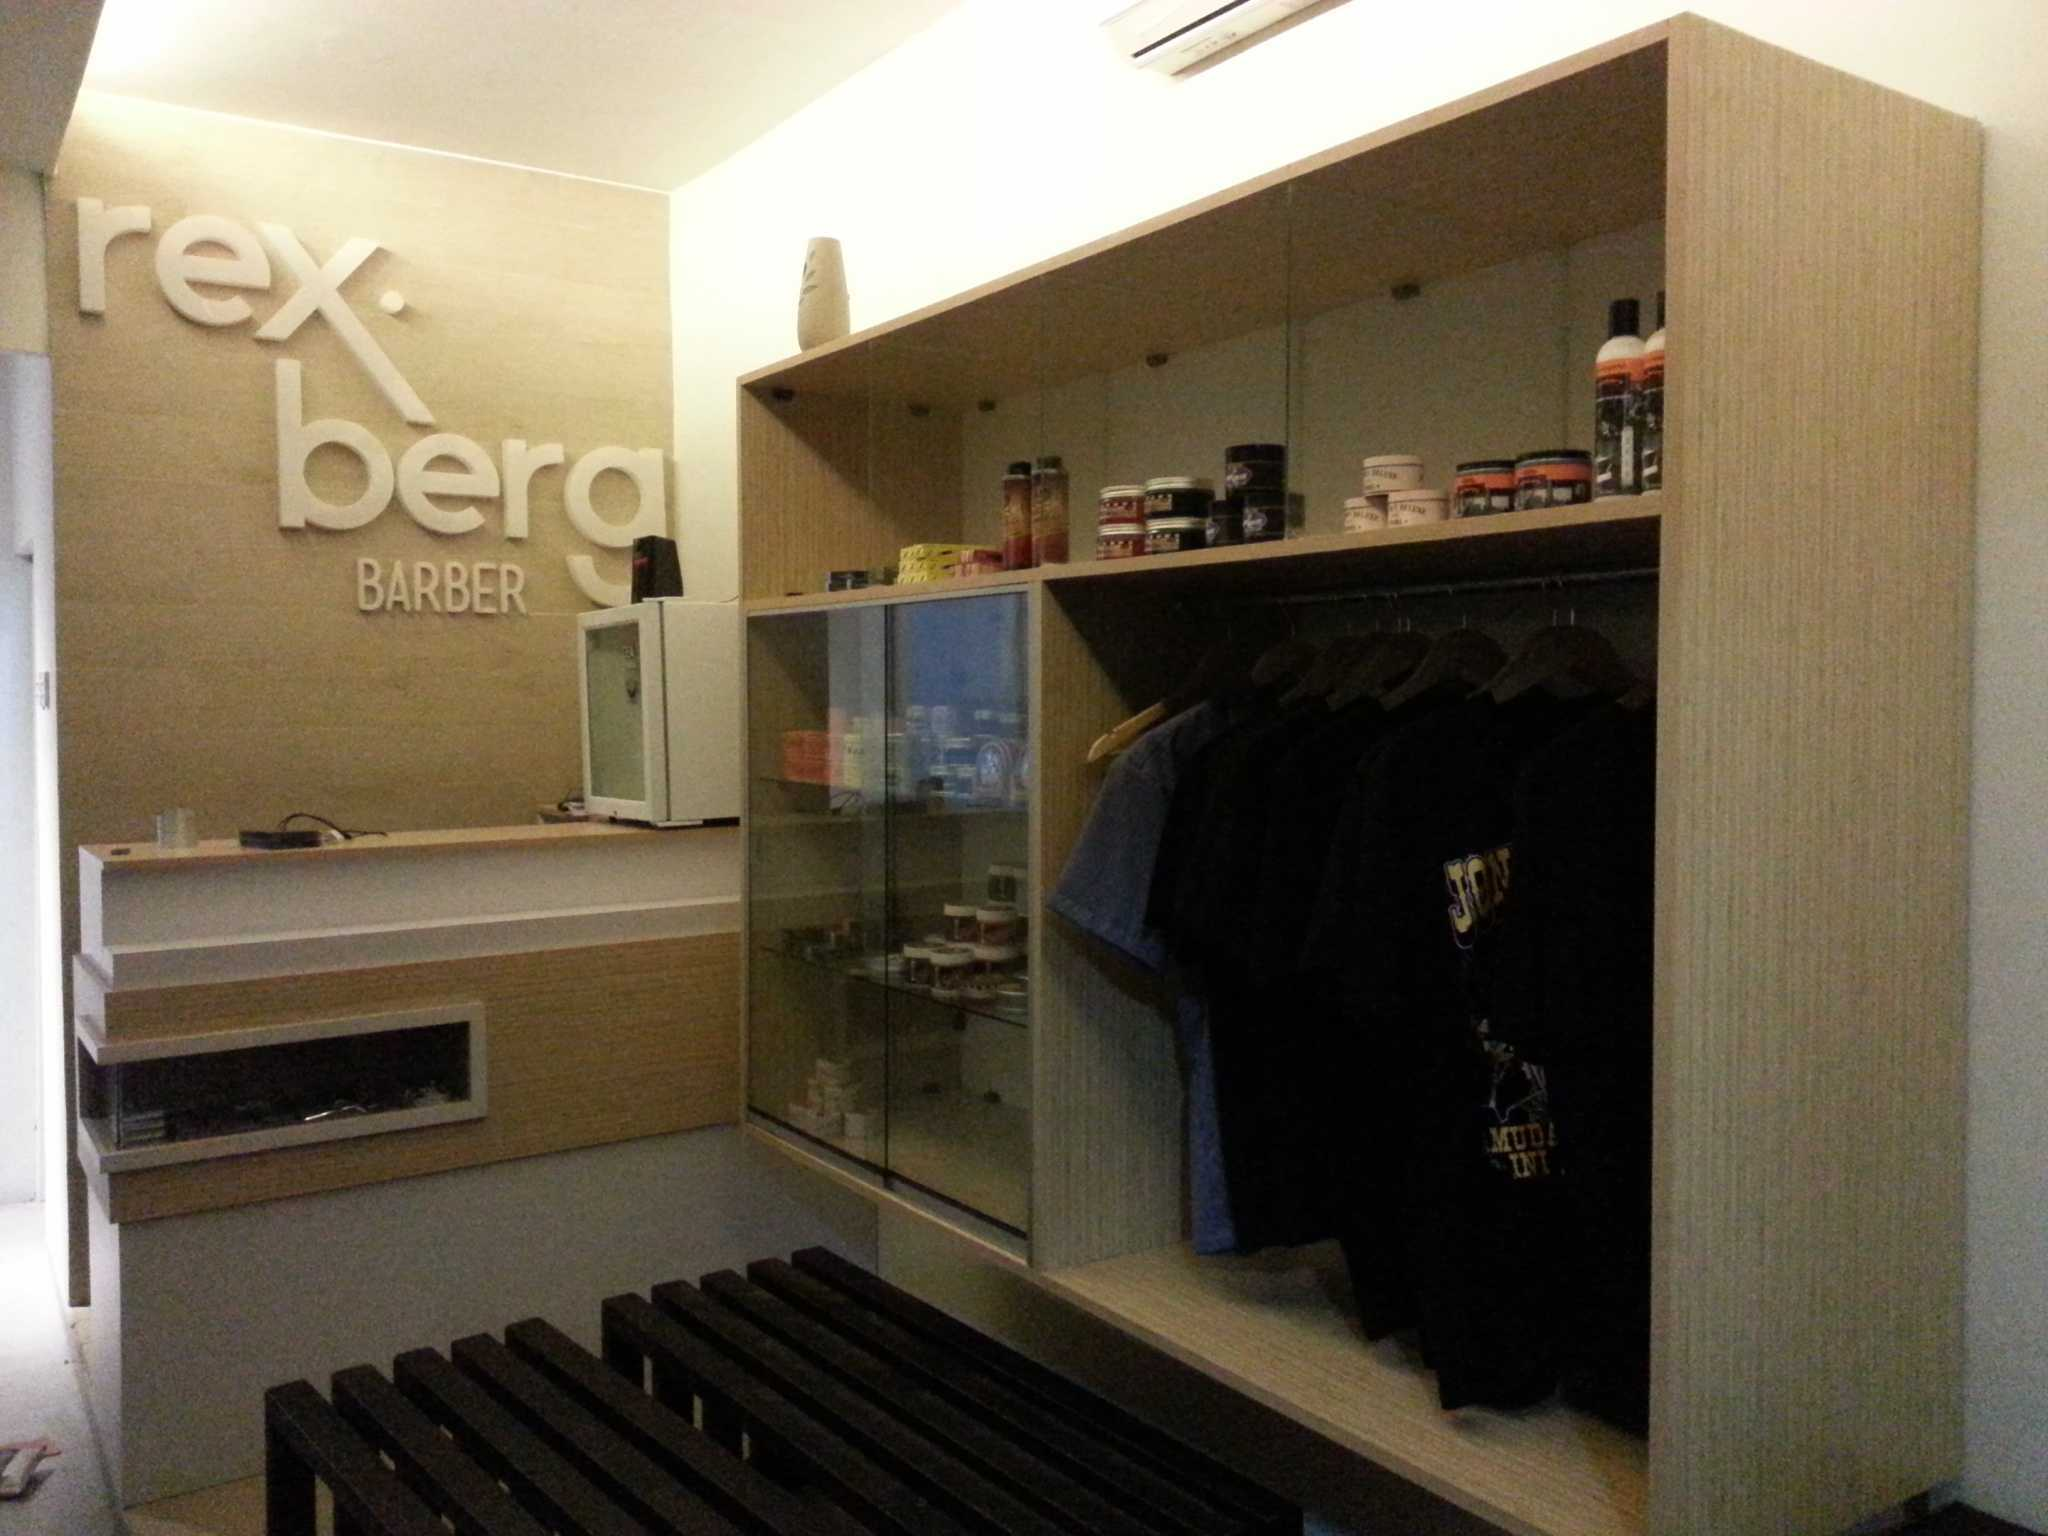 M.a.n Rexberg Barbershop West Karawang, Karawang Regency, West Java, Indonesia West Karawang, Karawang Regency, West Java, Indonesia 20151119002157 Modern  35856